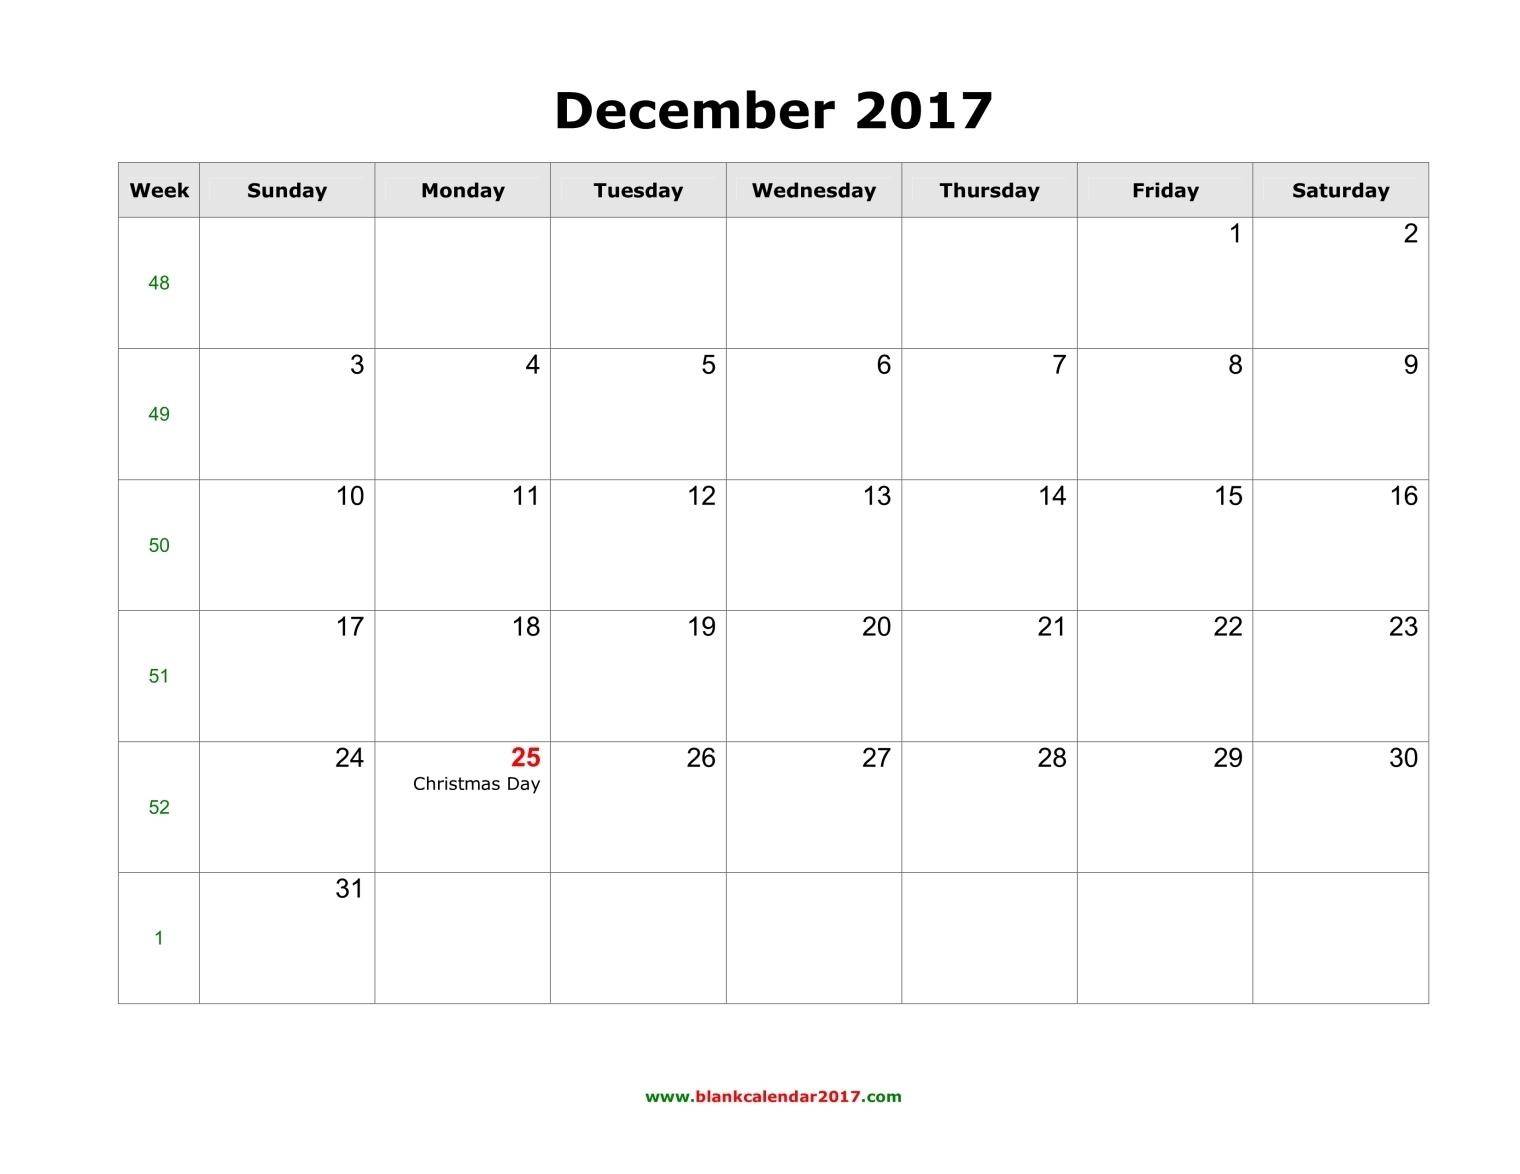 December 2017 Calendar Cute | printable calendar templates